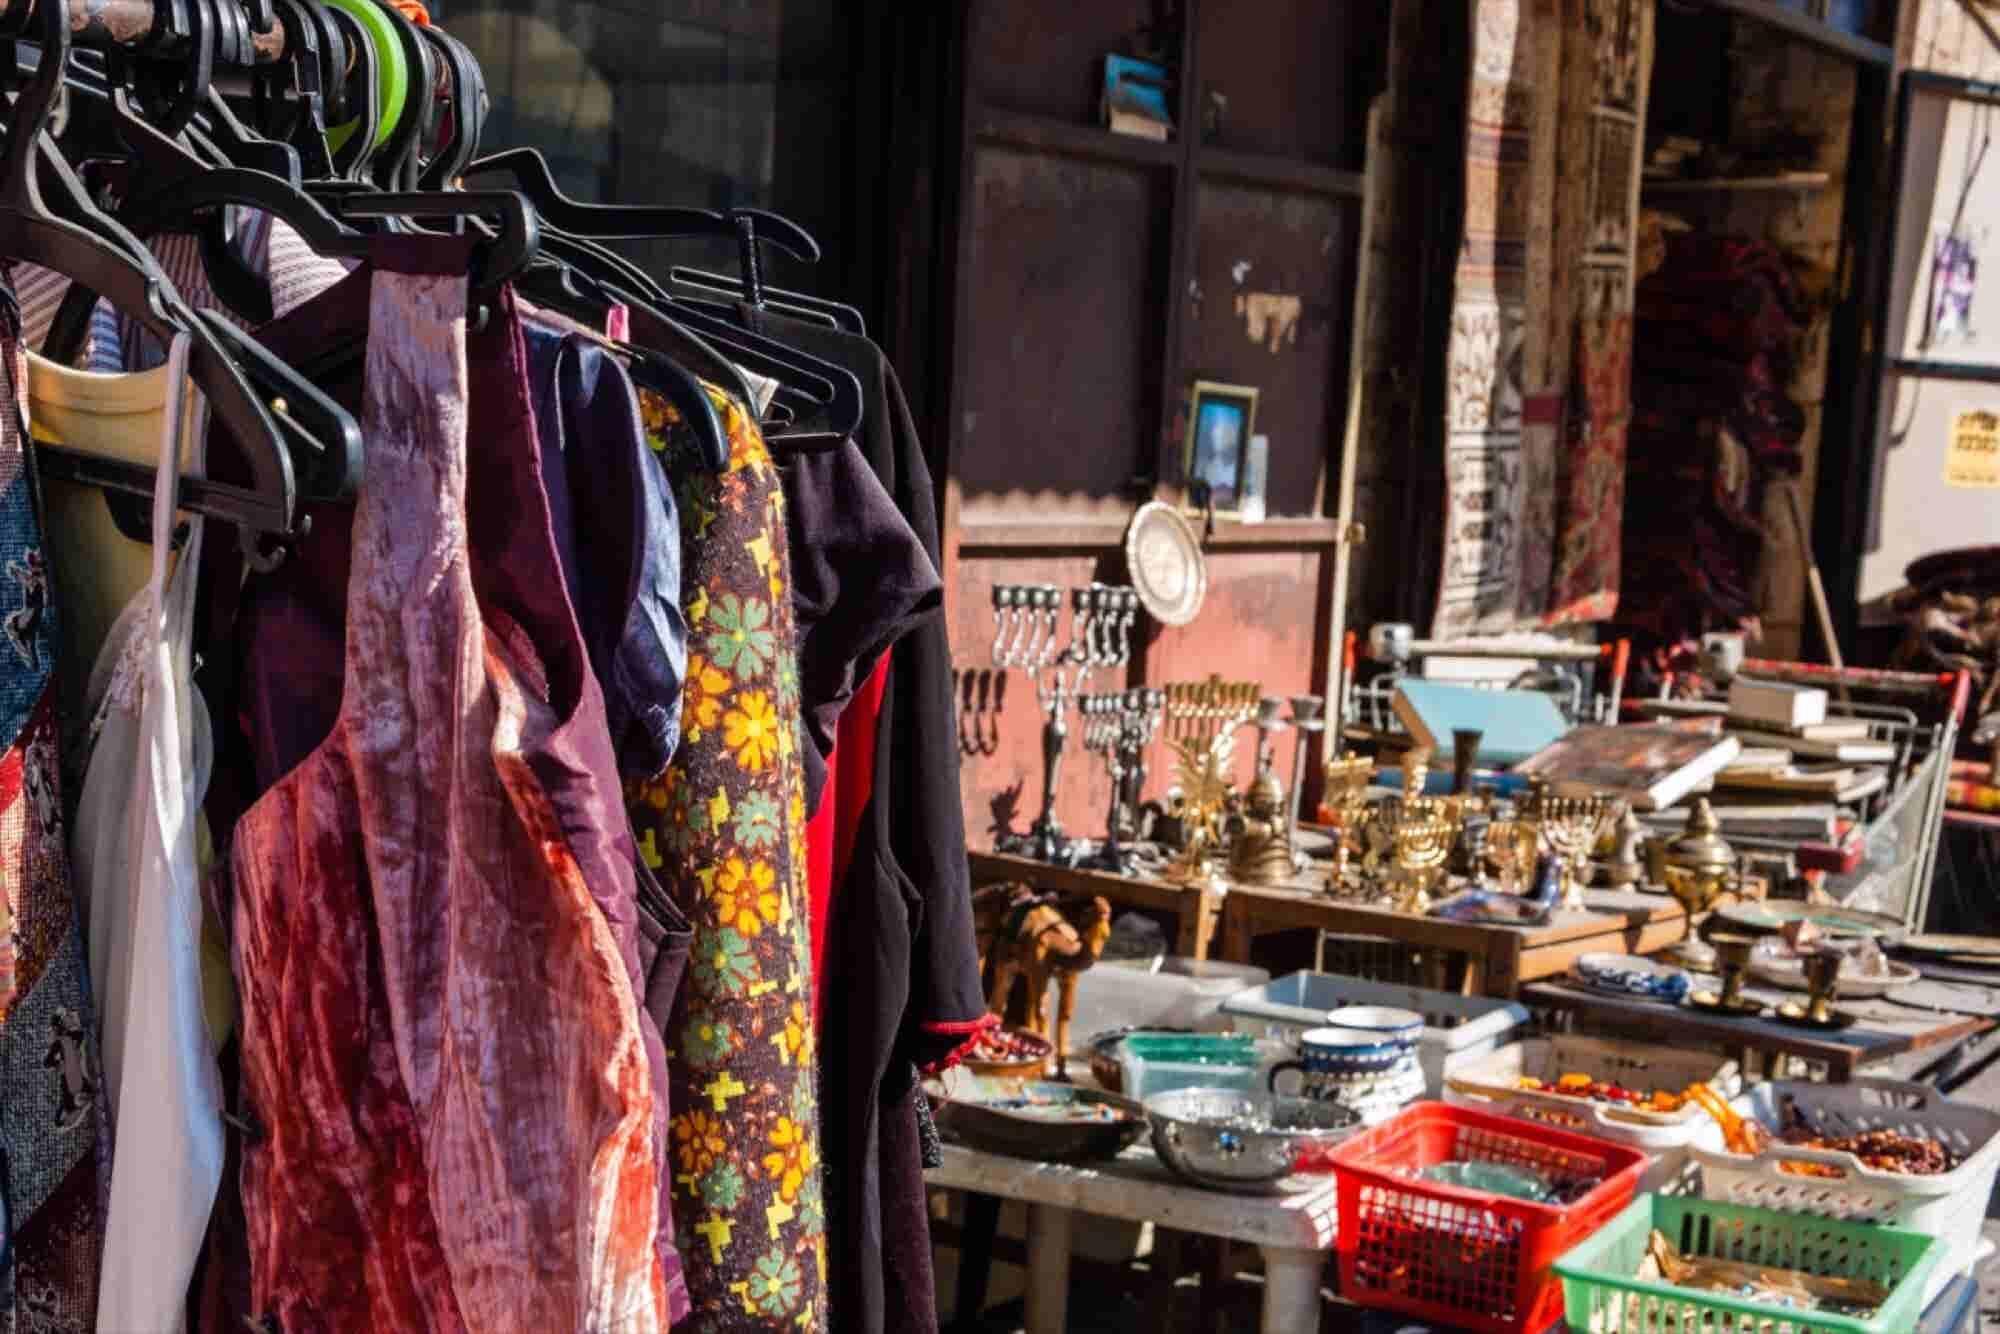 2 Entrepreneurs Disrupting the Reseller Marketplace